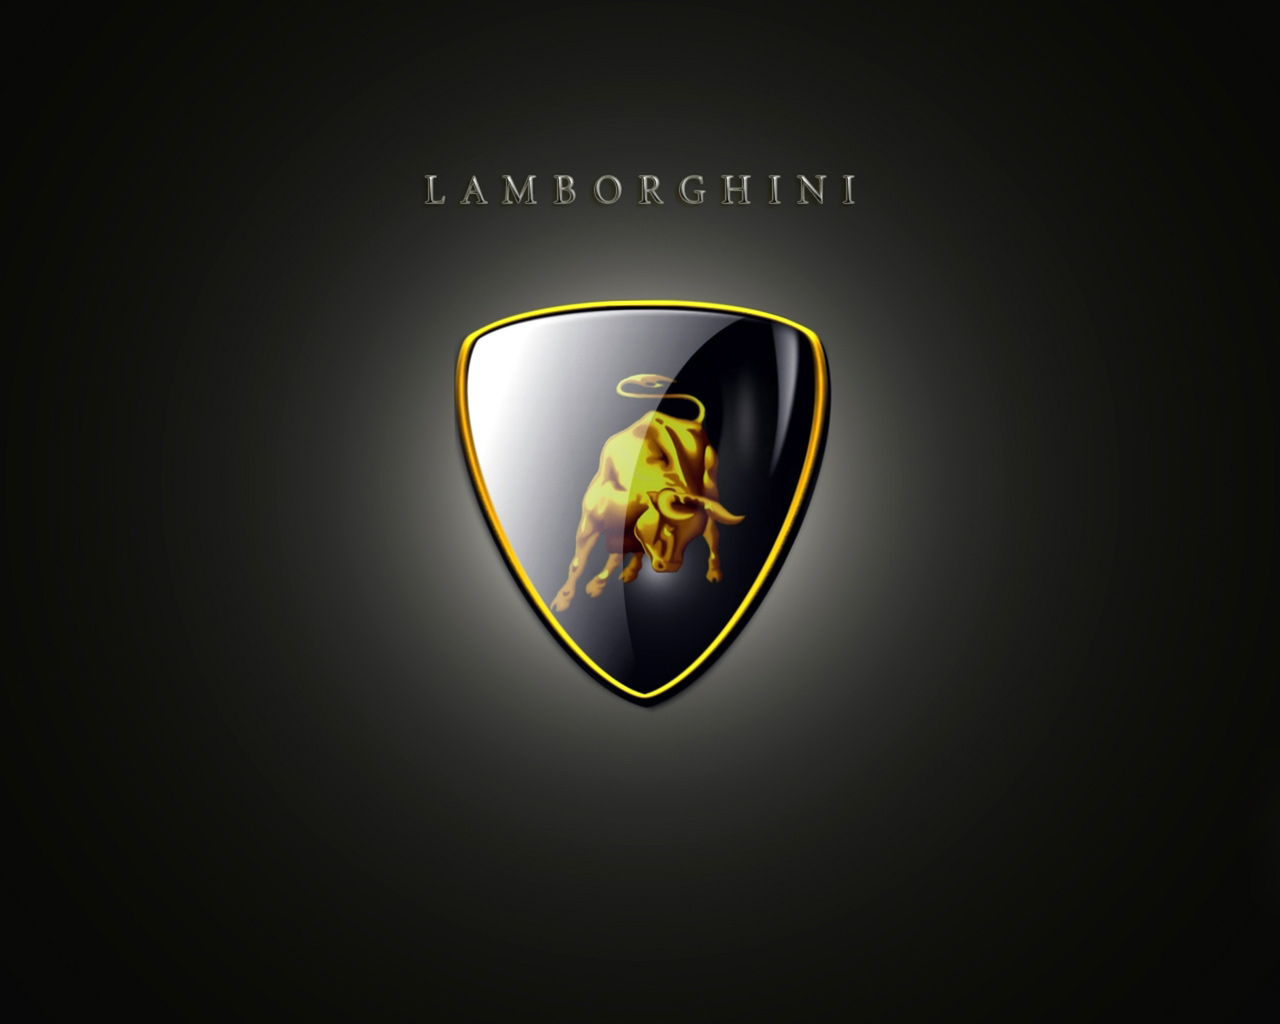 lamborghini logo wallpaper hd images